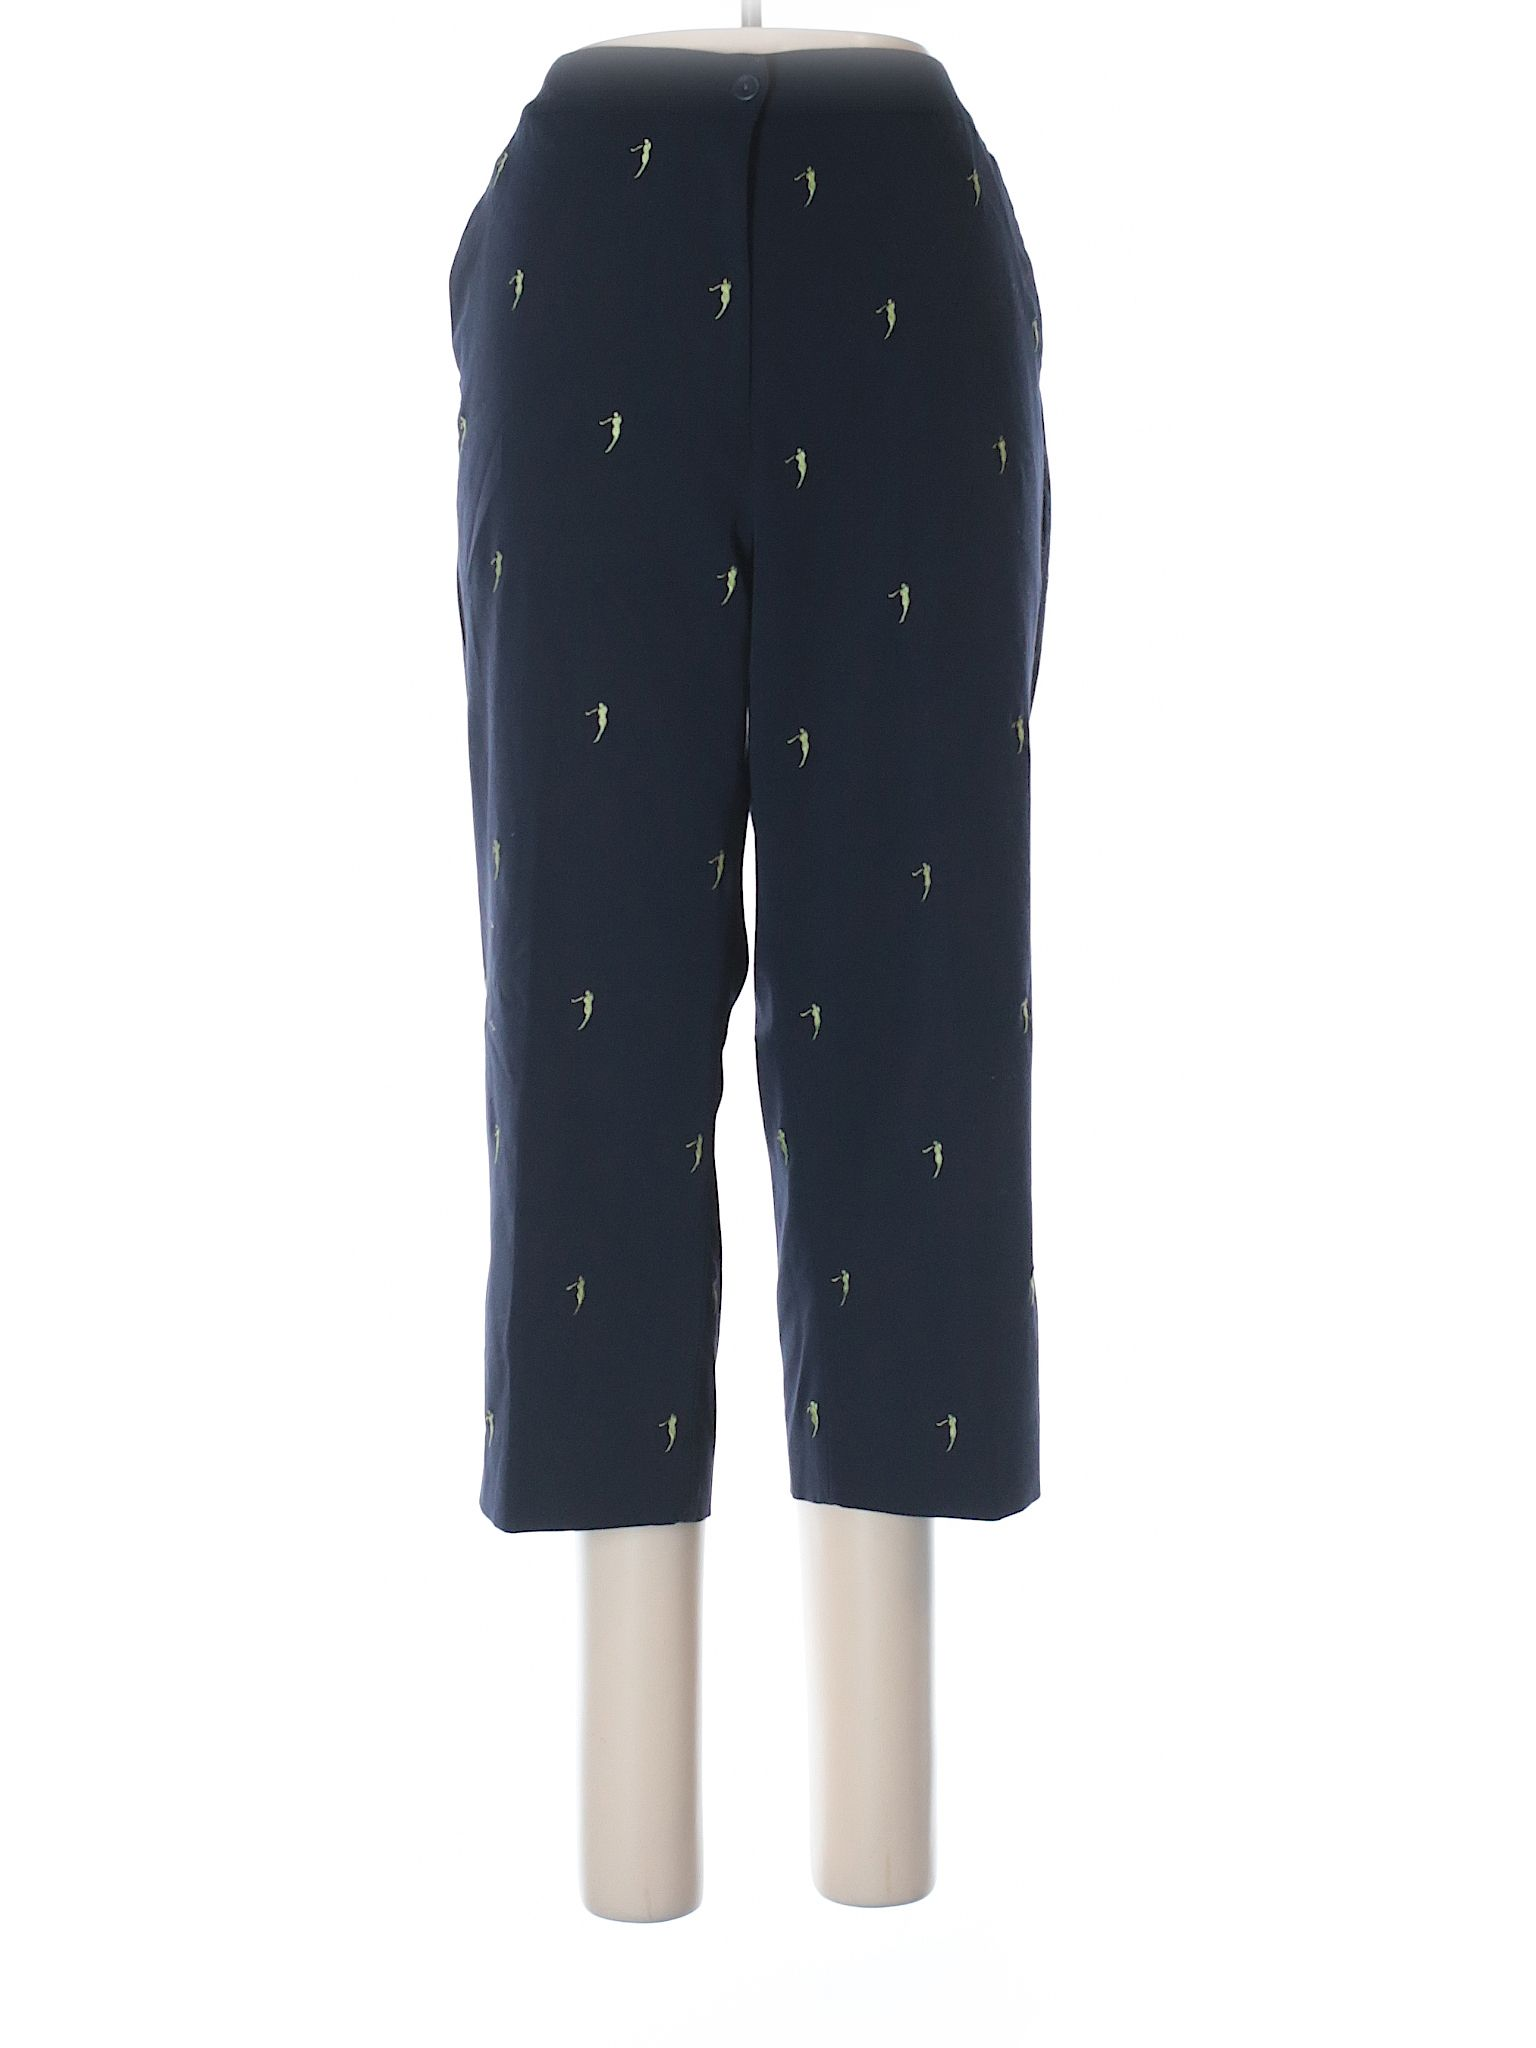 Ep Pro Khakis Size 1200 Navy Blue Womens Bottoms